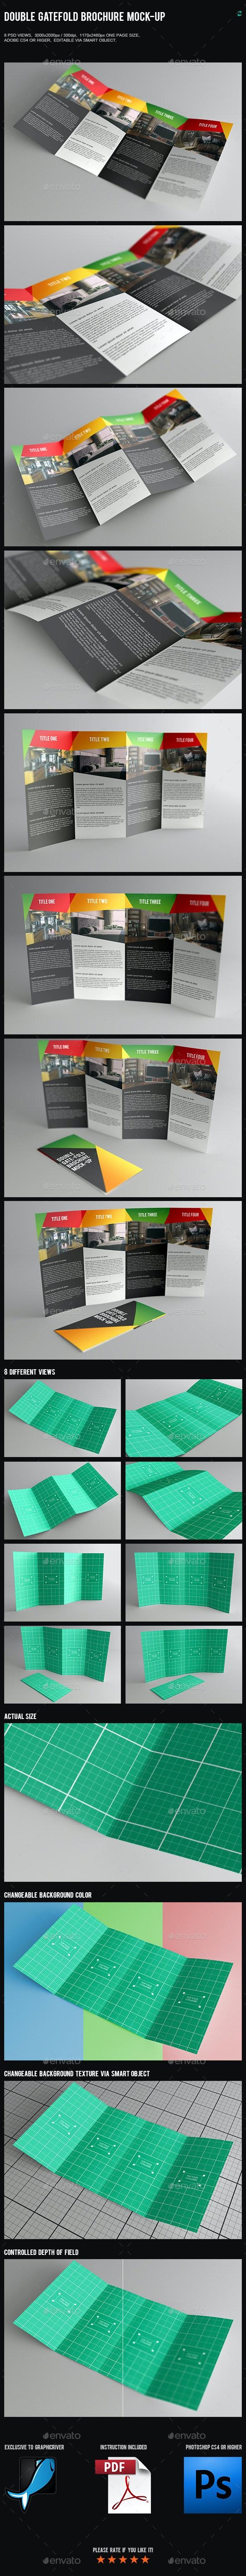 Double Gatefold Brochure Mock-Up - Brochures Print